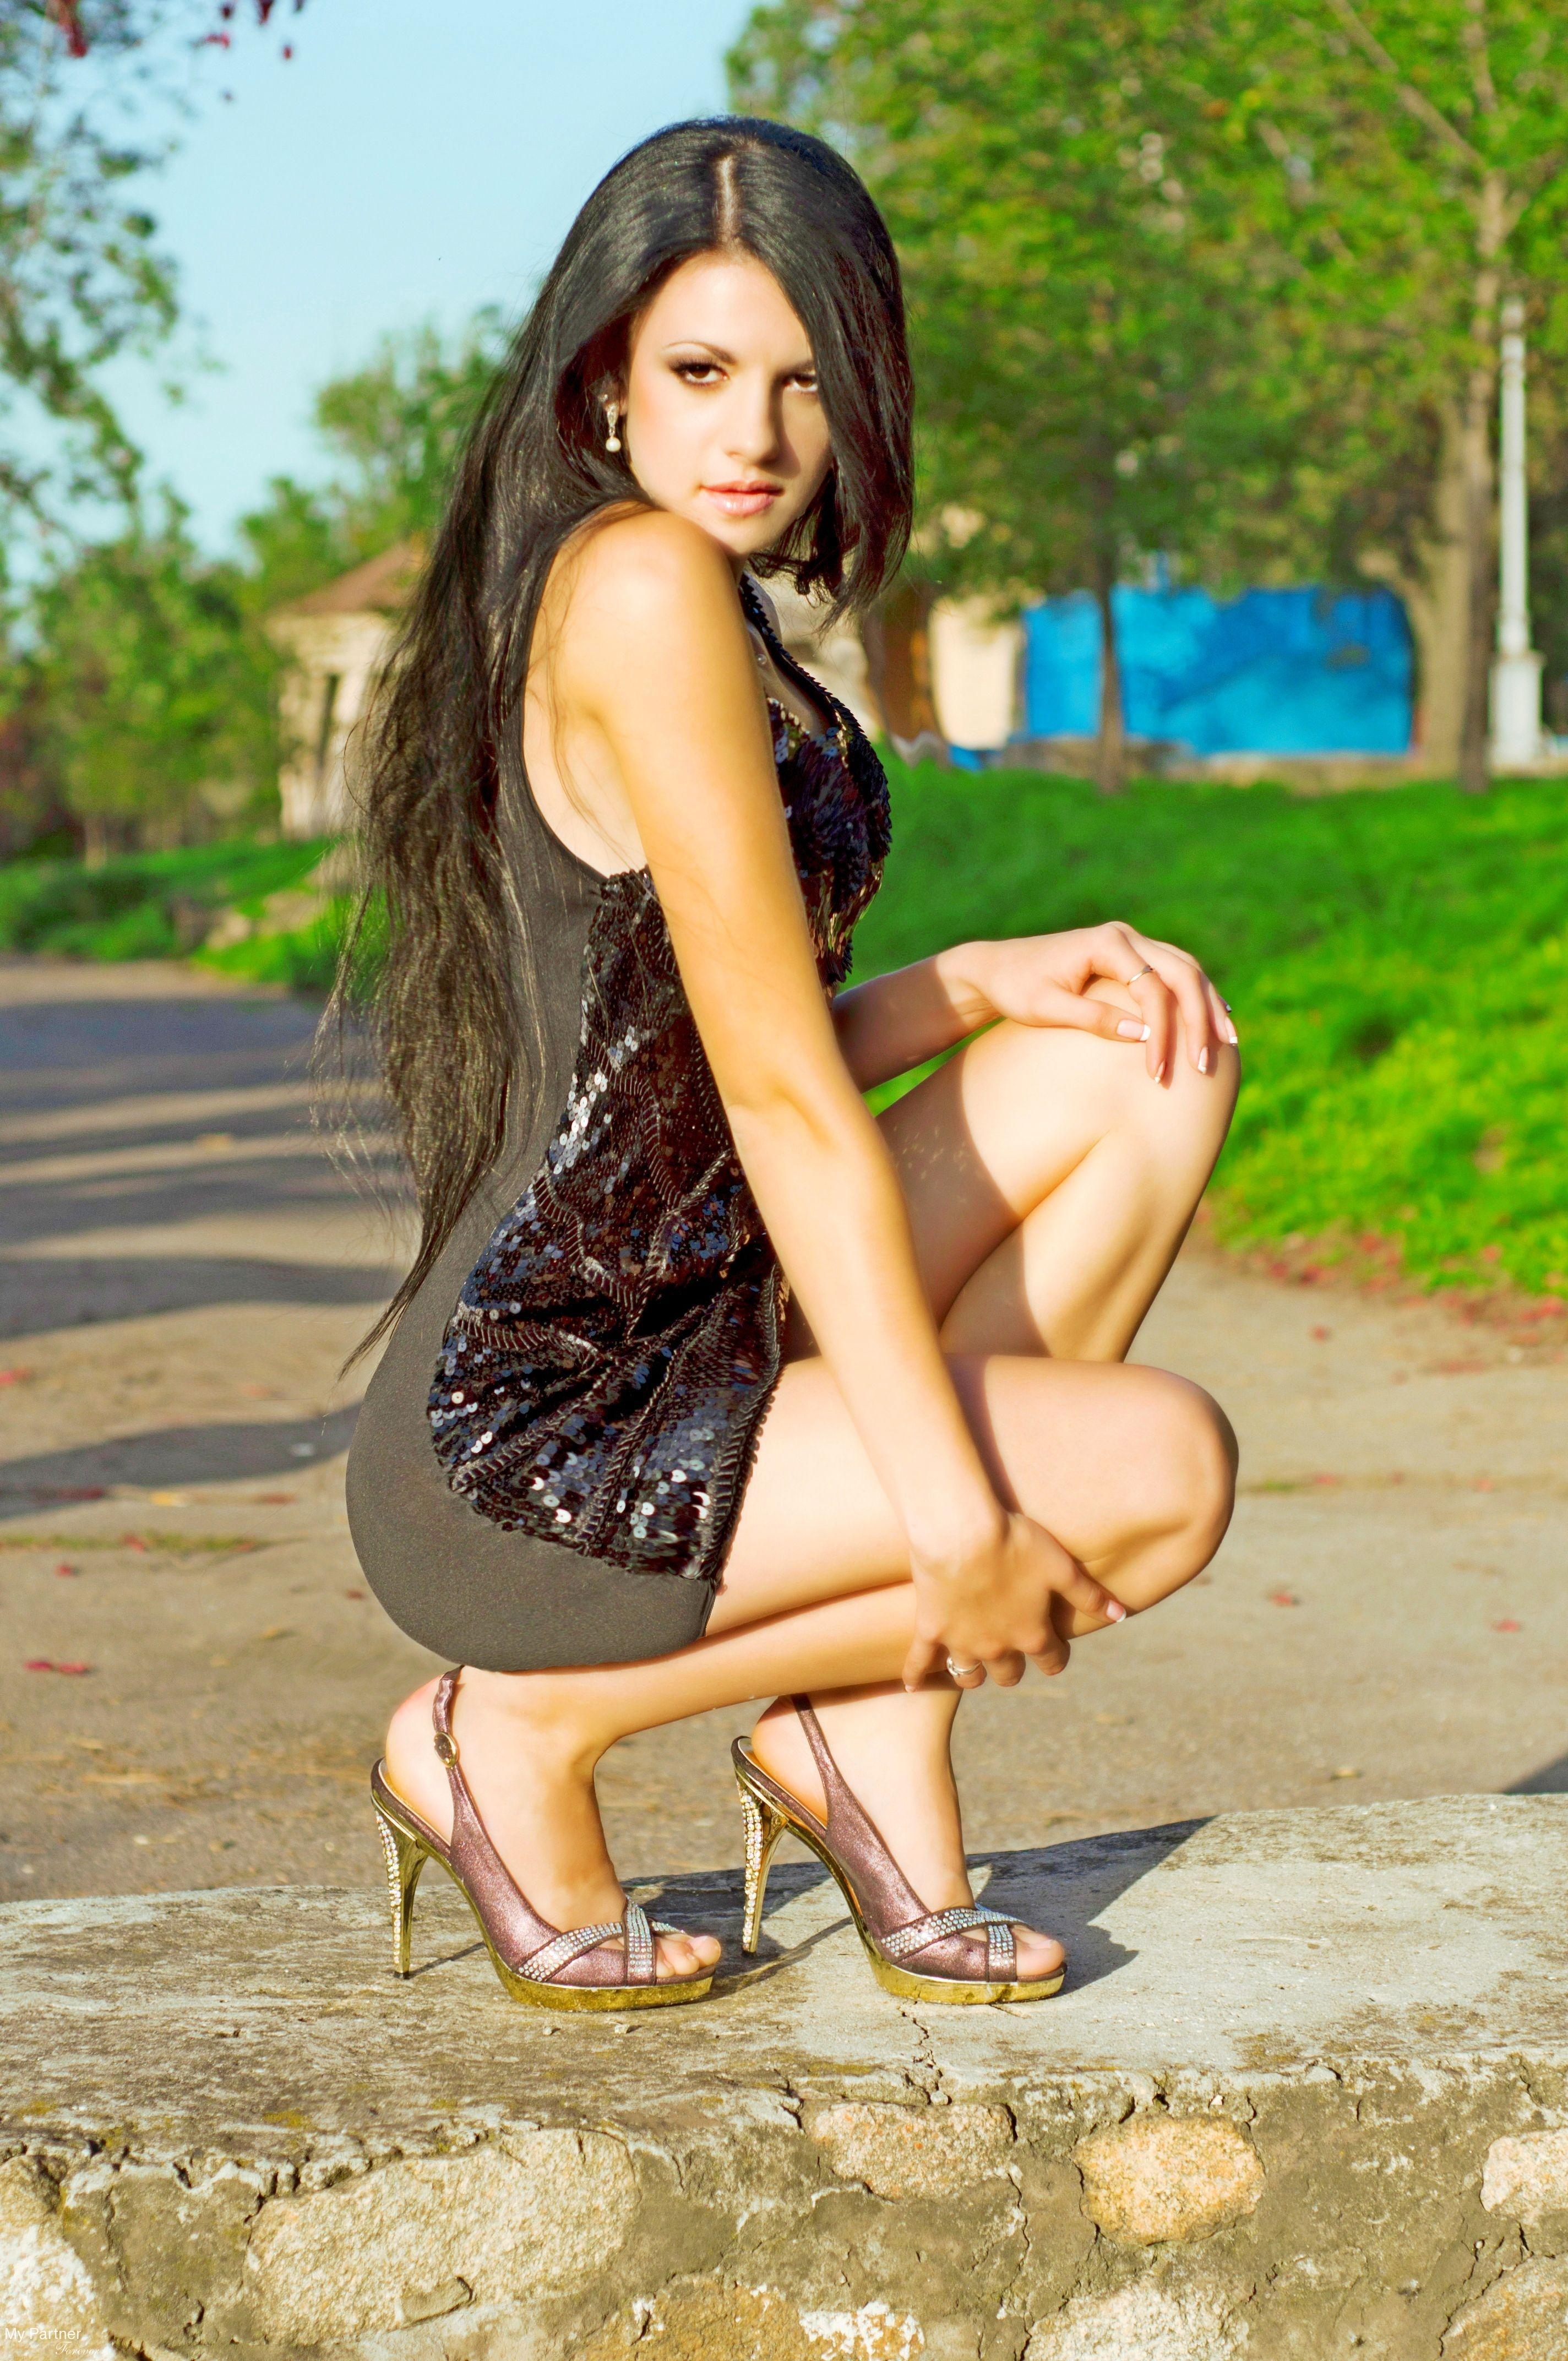 Anastasia russian dating service